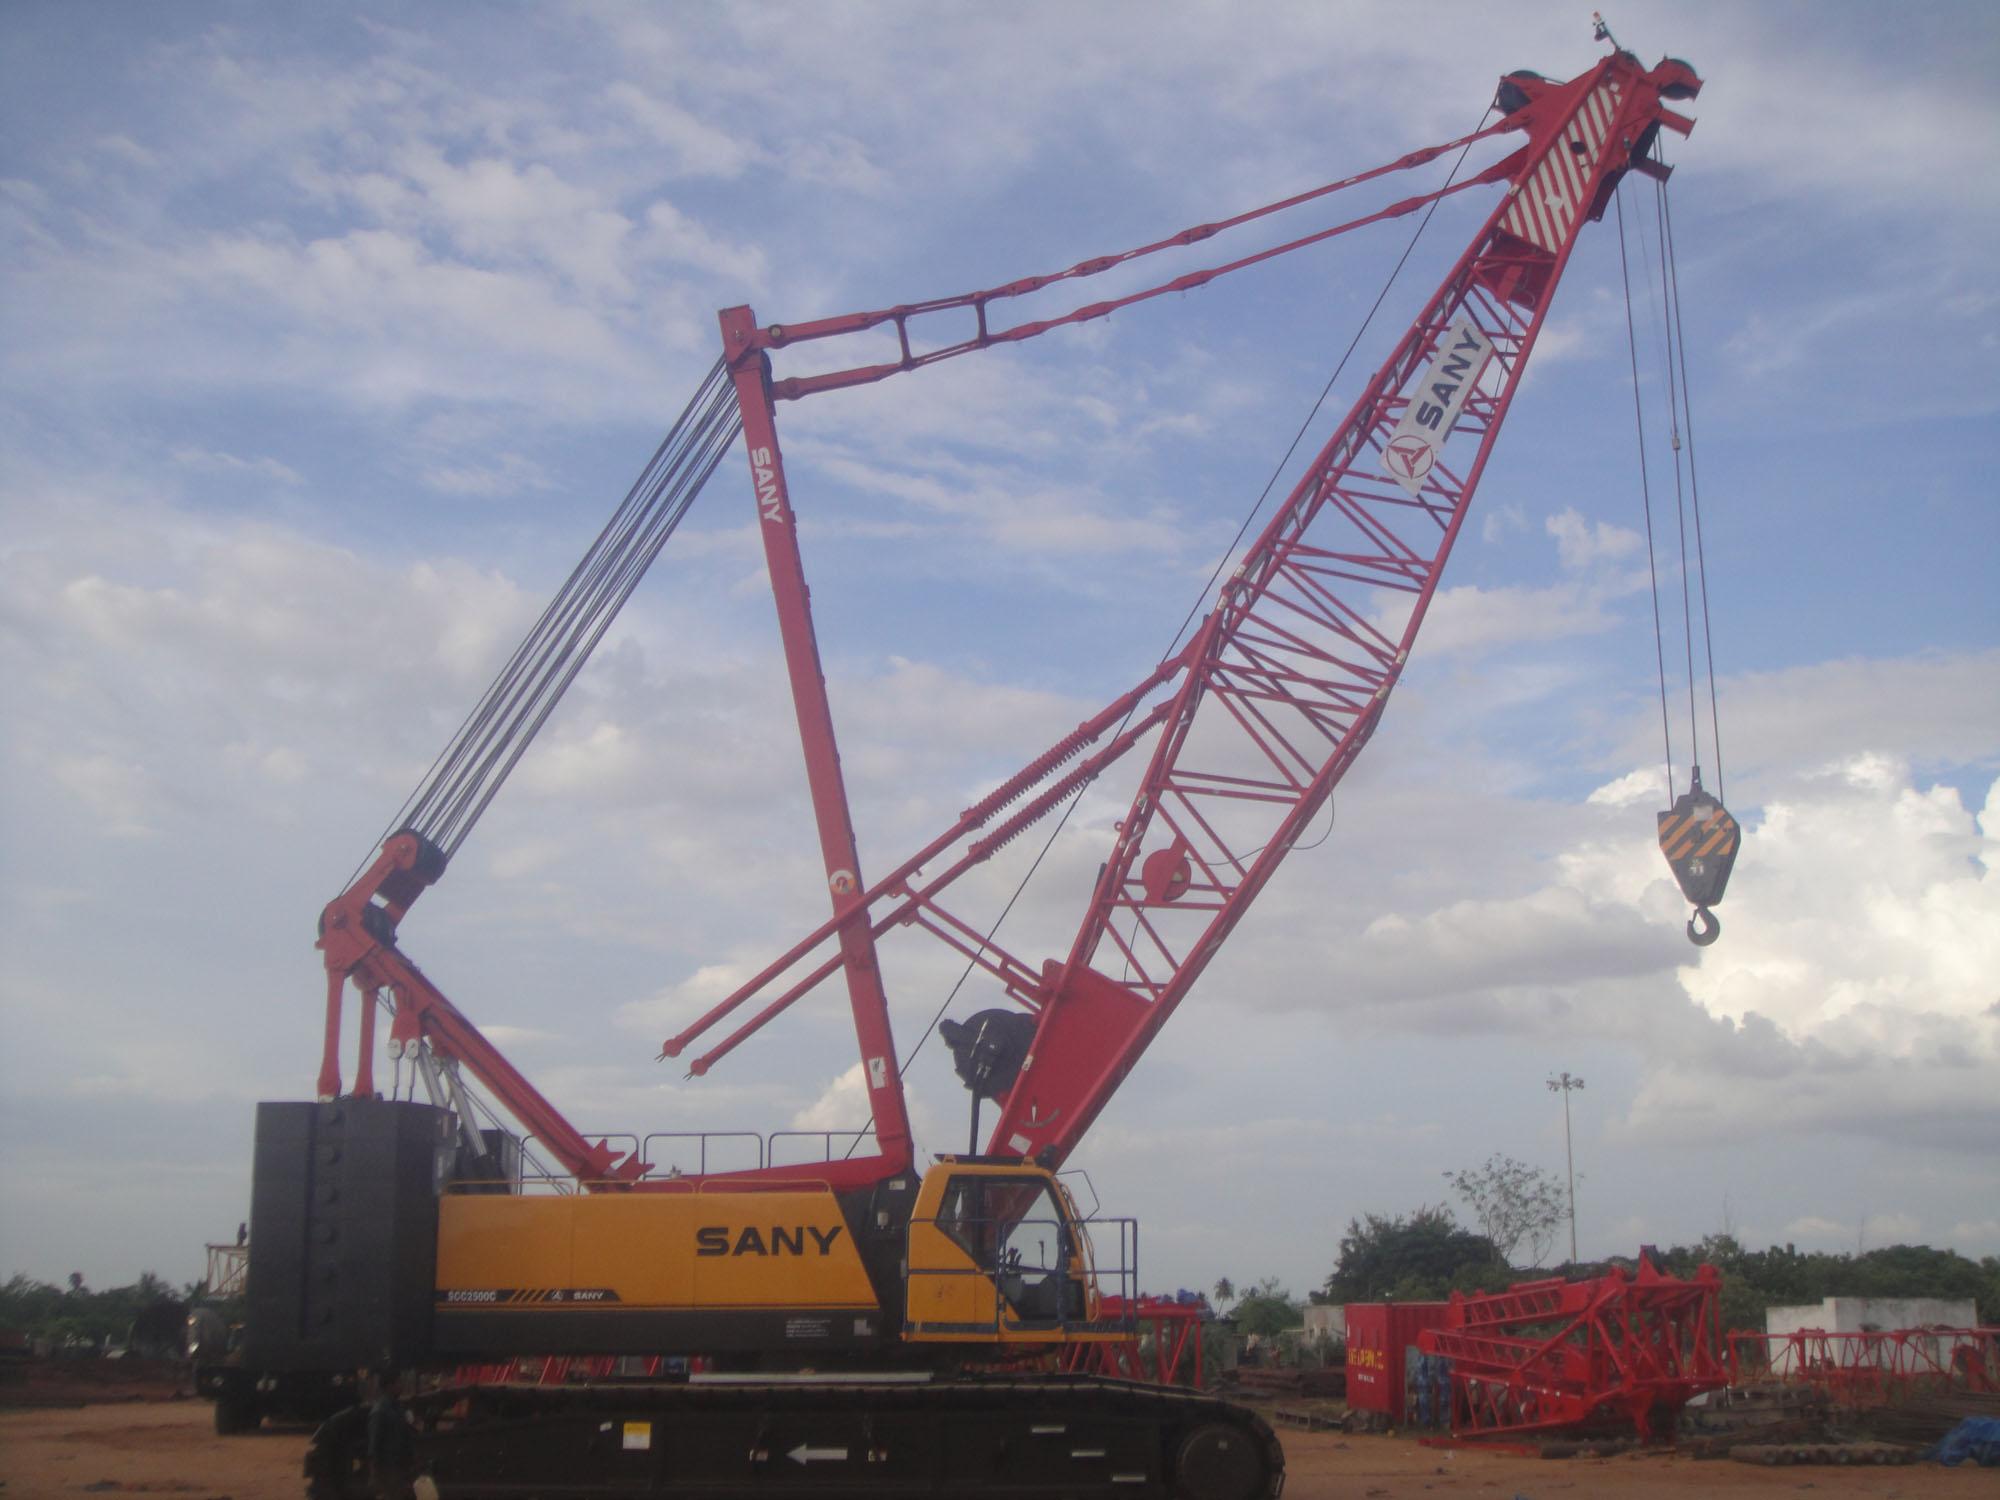 Sany 250T Crane